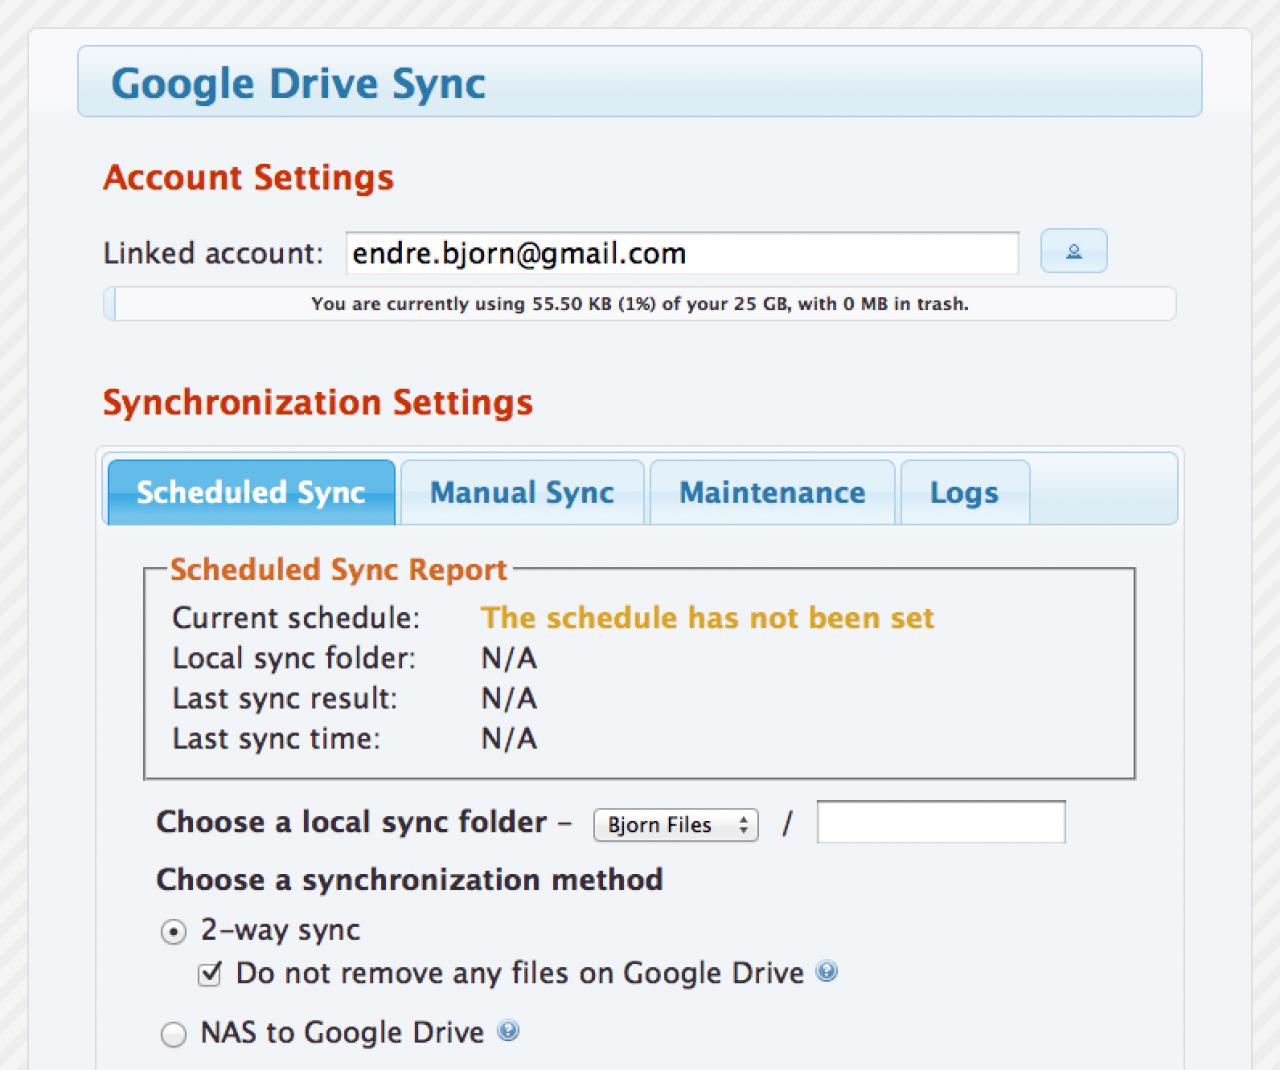 gdrive_sync